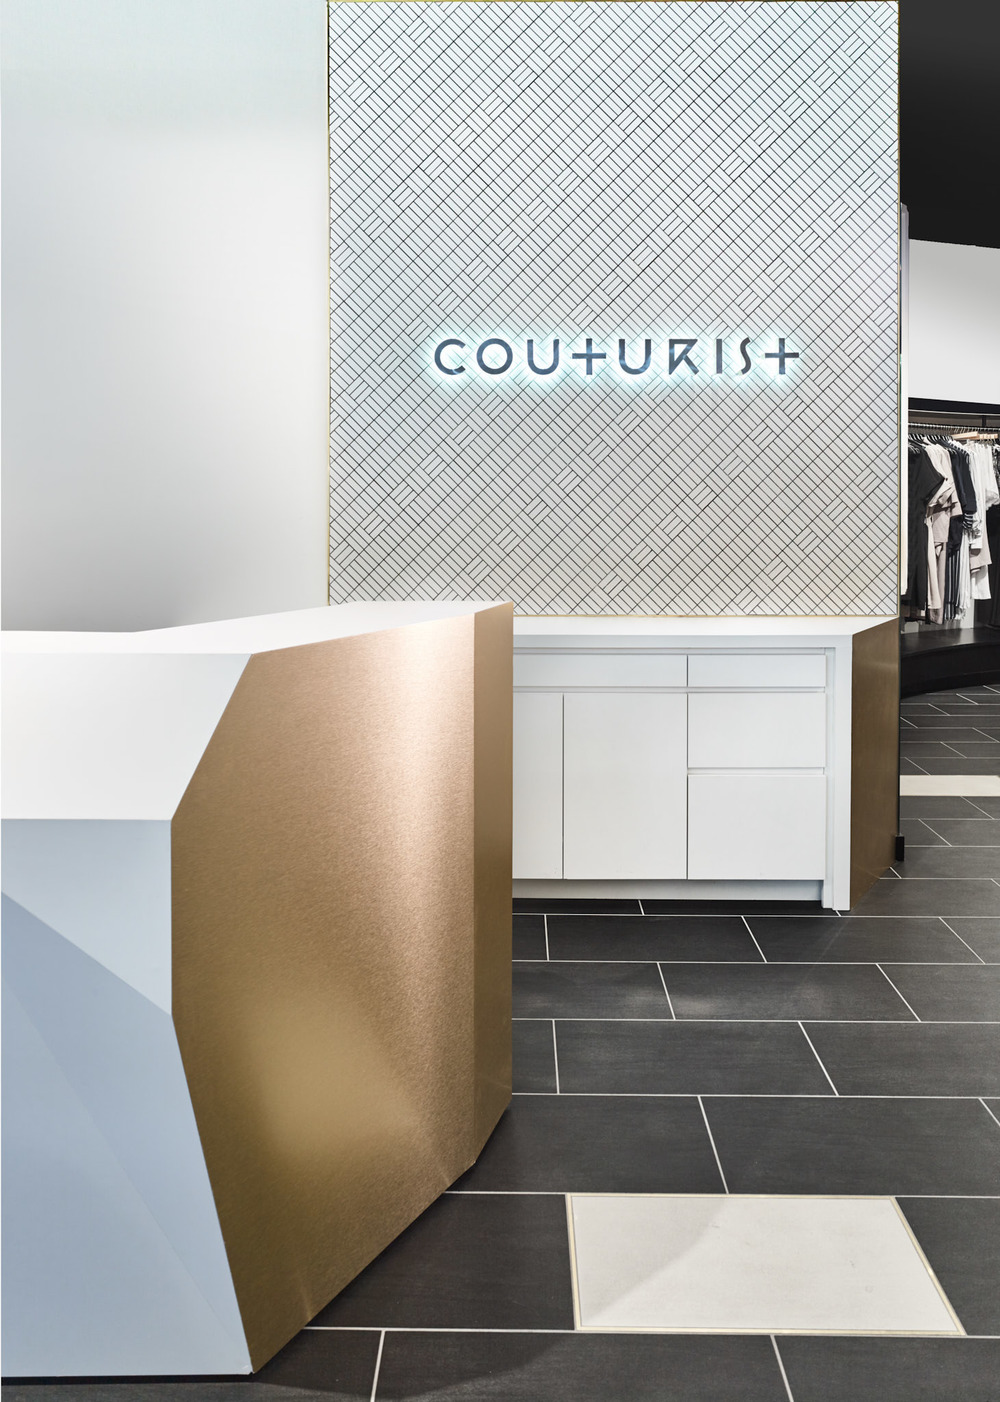 Couturist - Vancouver Fashion